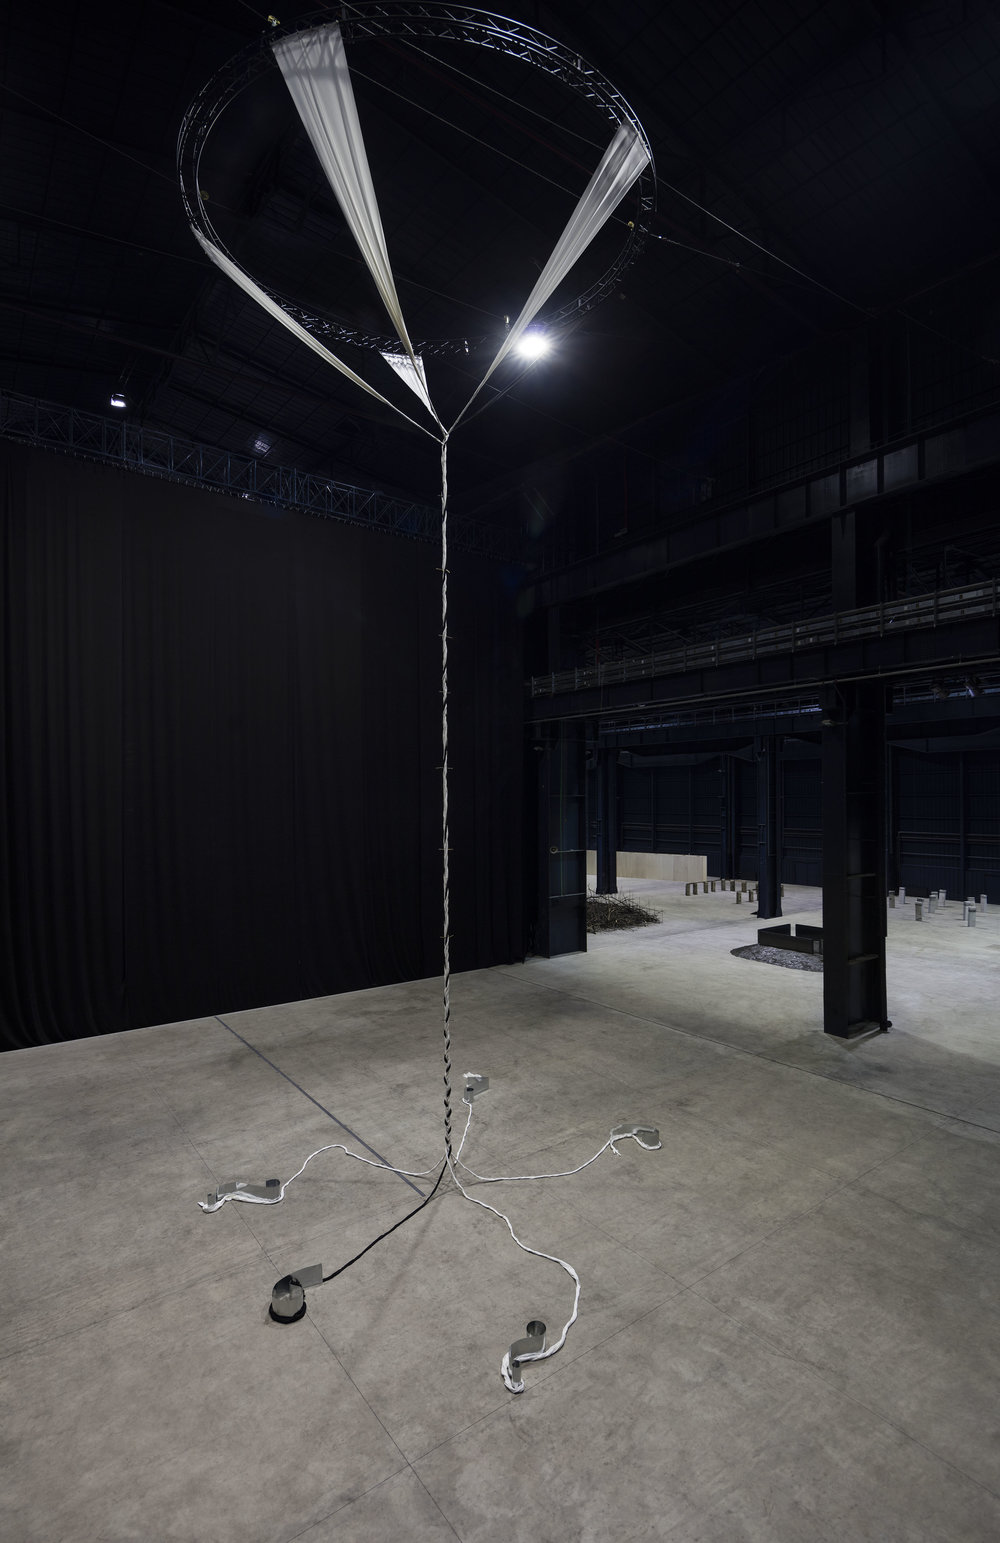 Critical Sections , 1984/2016 節の臨界 ( setsu no rinkai ) Cloth, twigs, zinc plates Installation view, Kishio Suga: Situations , Pirelli HangarBicocca, Milan, 2016 Photo: Agostino Osio; Courtesy Pirelli HangarBicocca, Milan